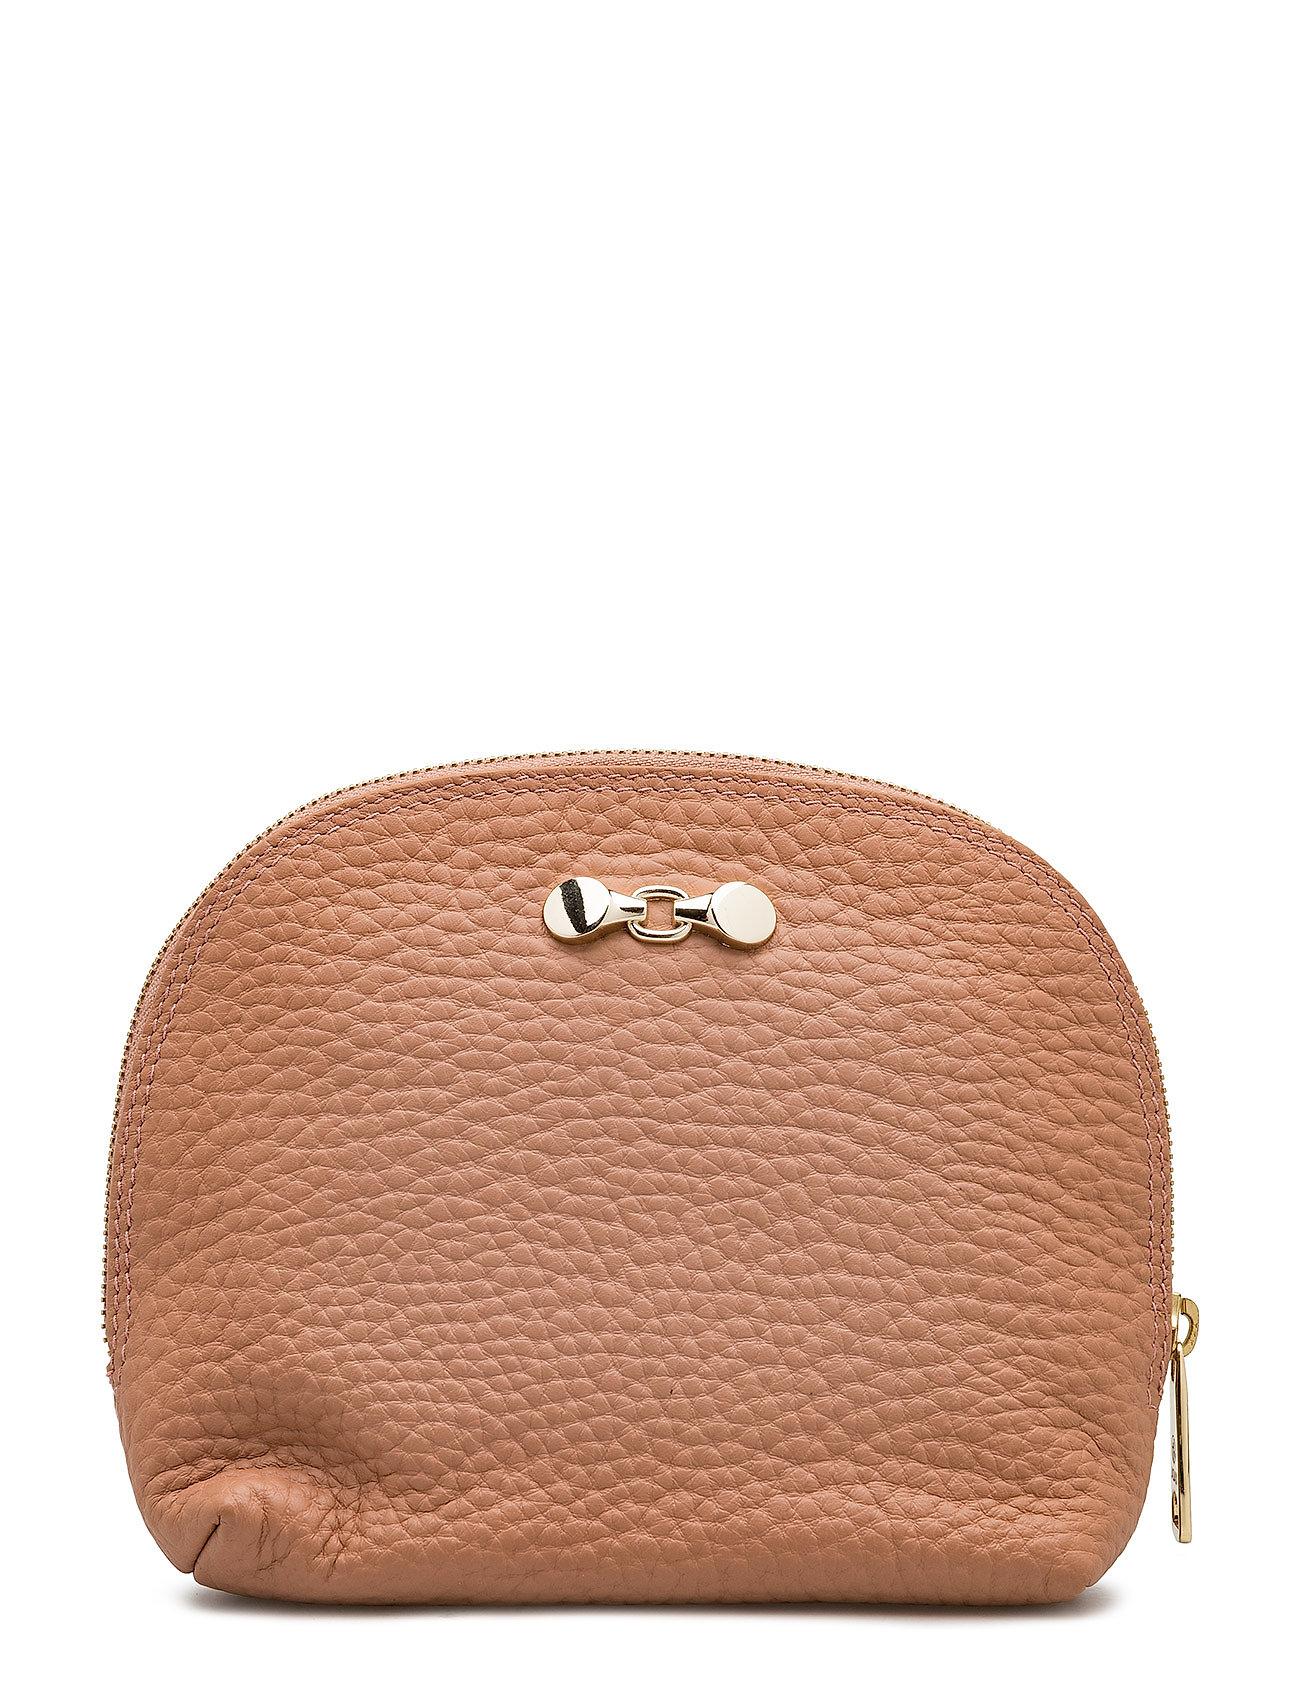 adax – Caroline berg cosmetic purse inger på boozt.com dk